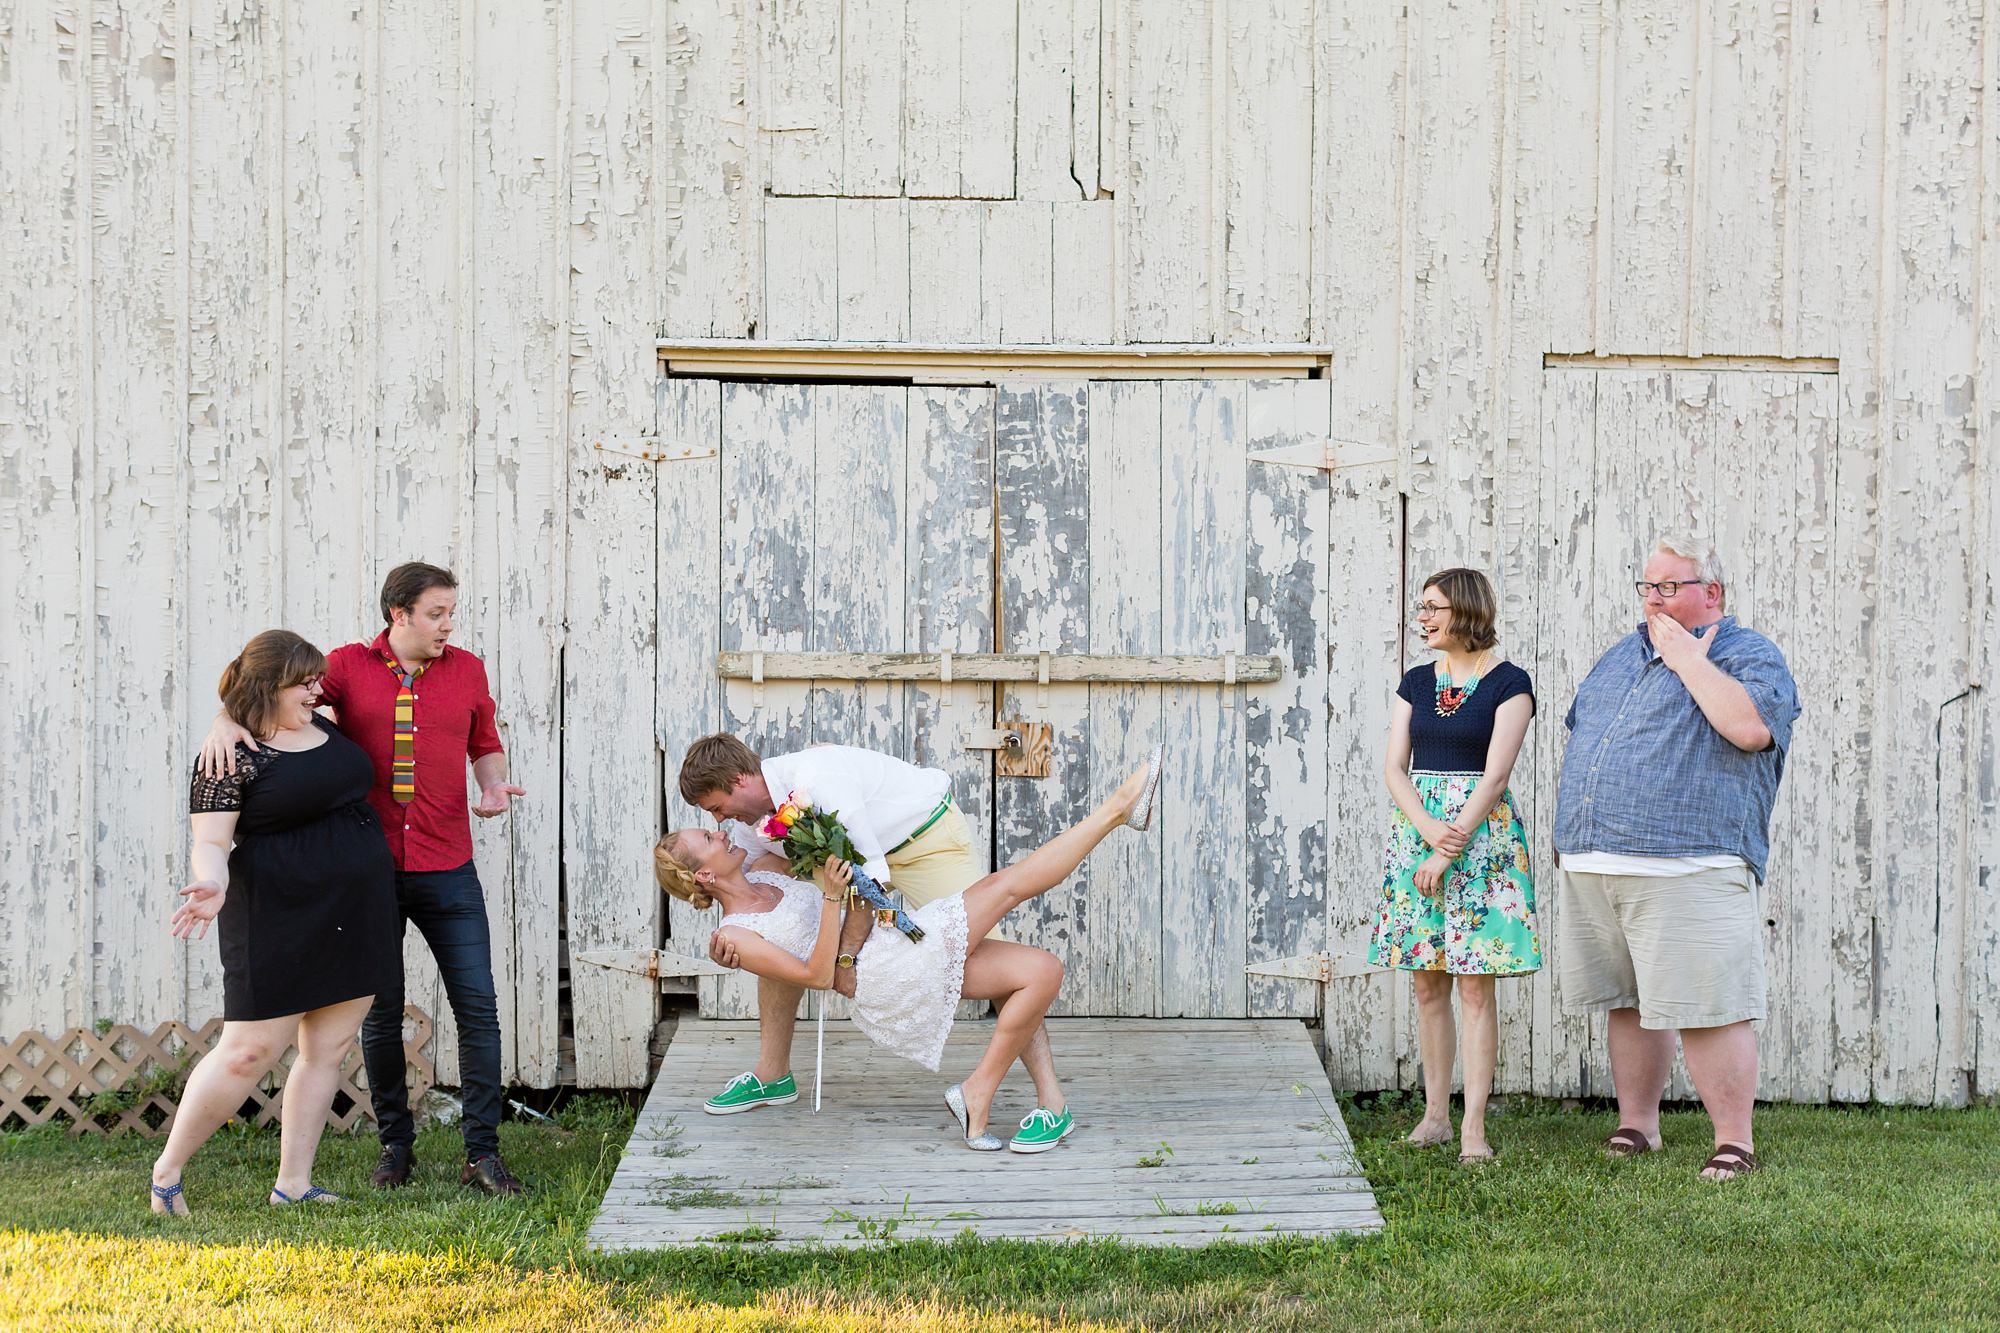 Wedding party photography with dip at Ft. Wayne Indiana destination wedding